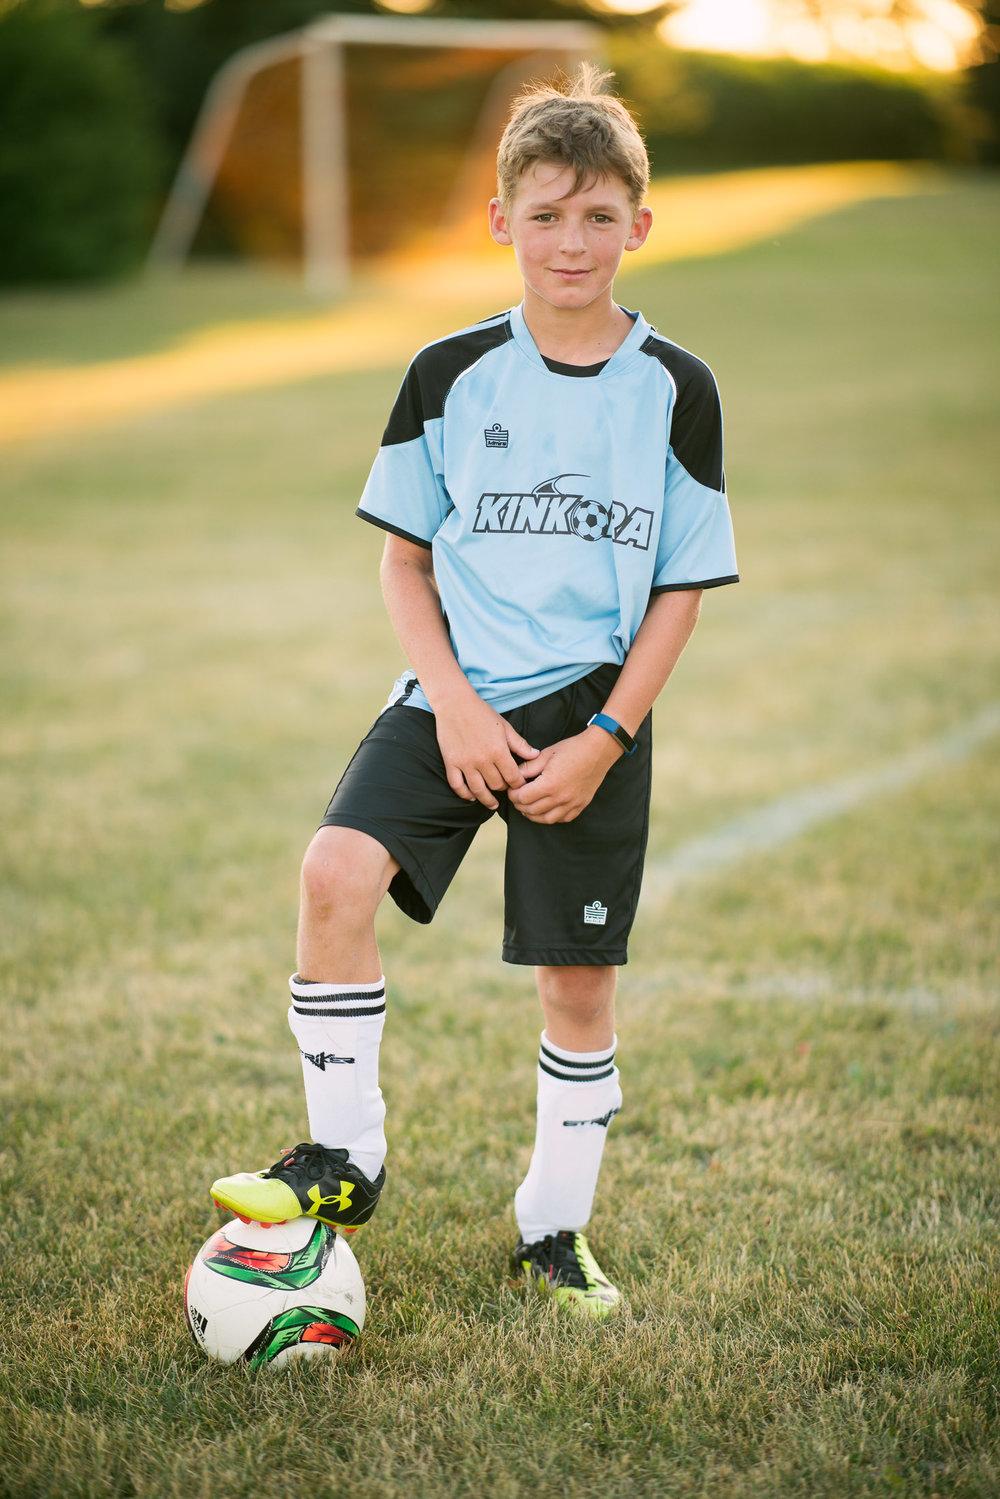 Kinkora-Soccer-Photos-062.jpg